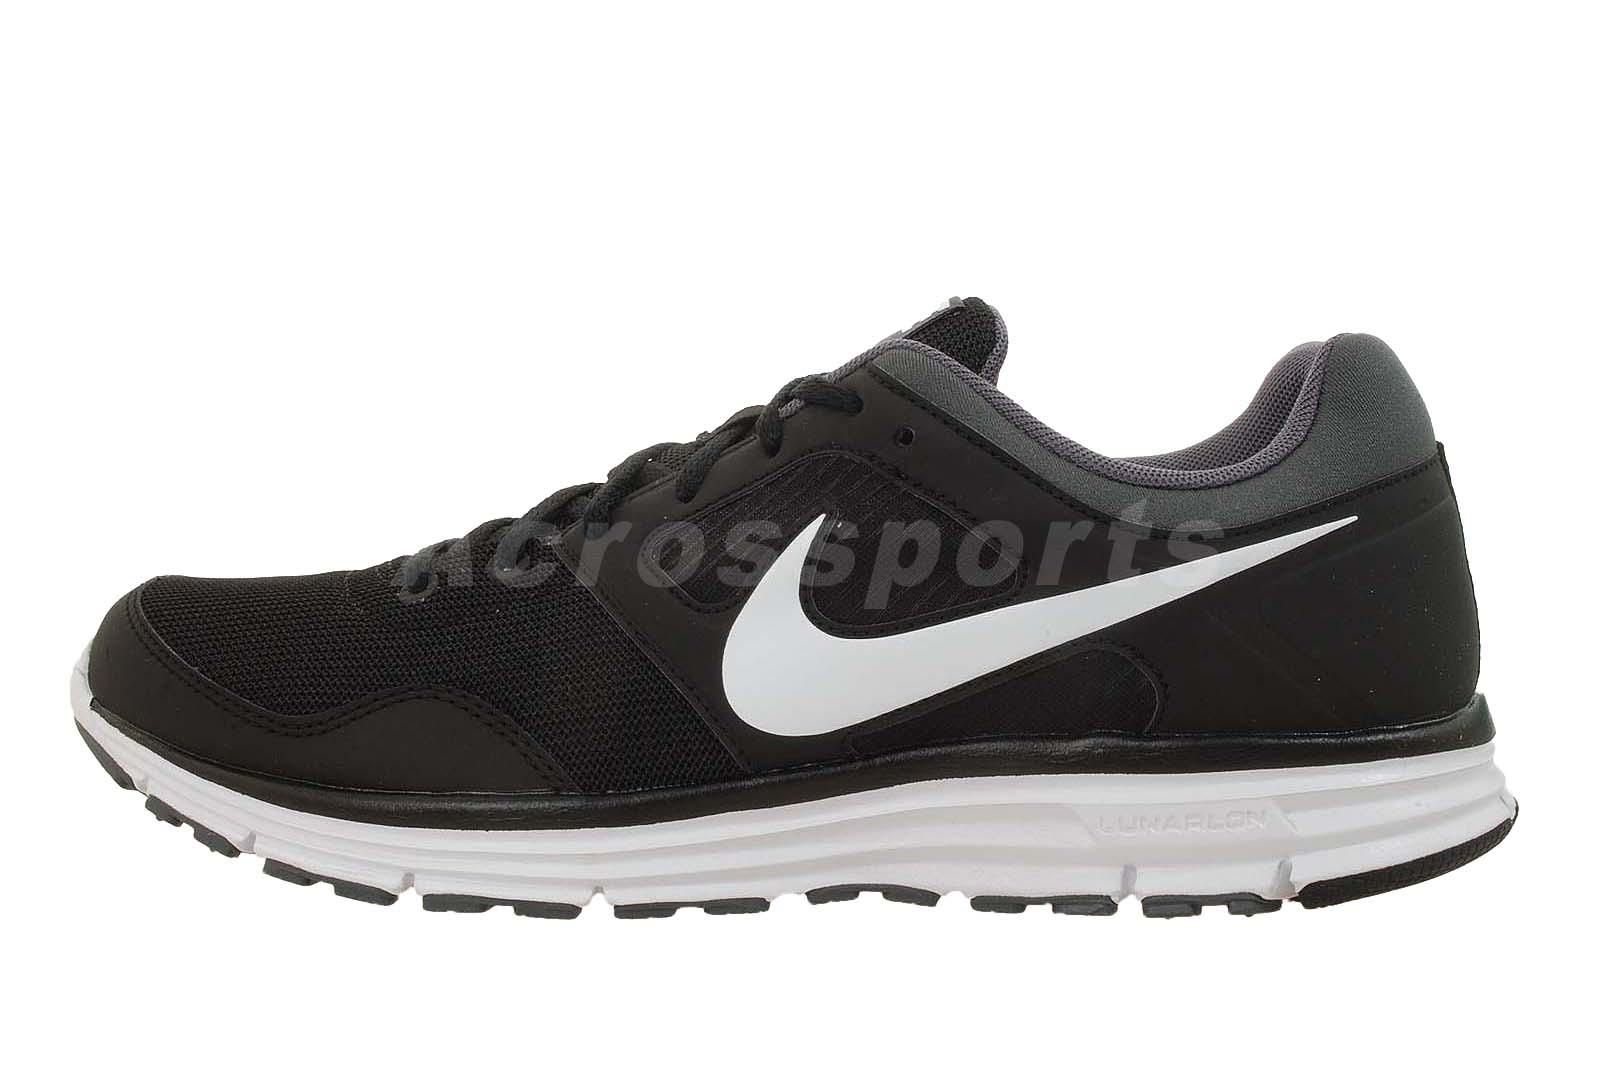 Mens Nike Lunarfly Shoes